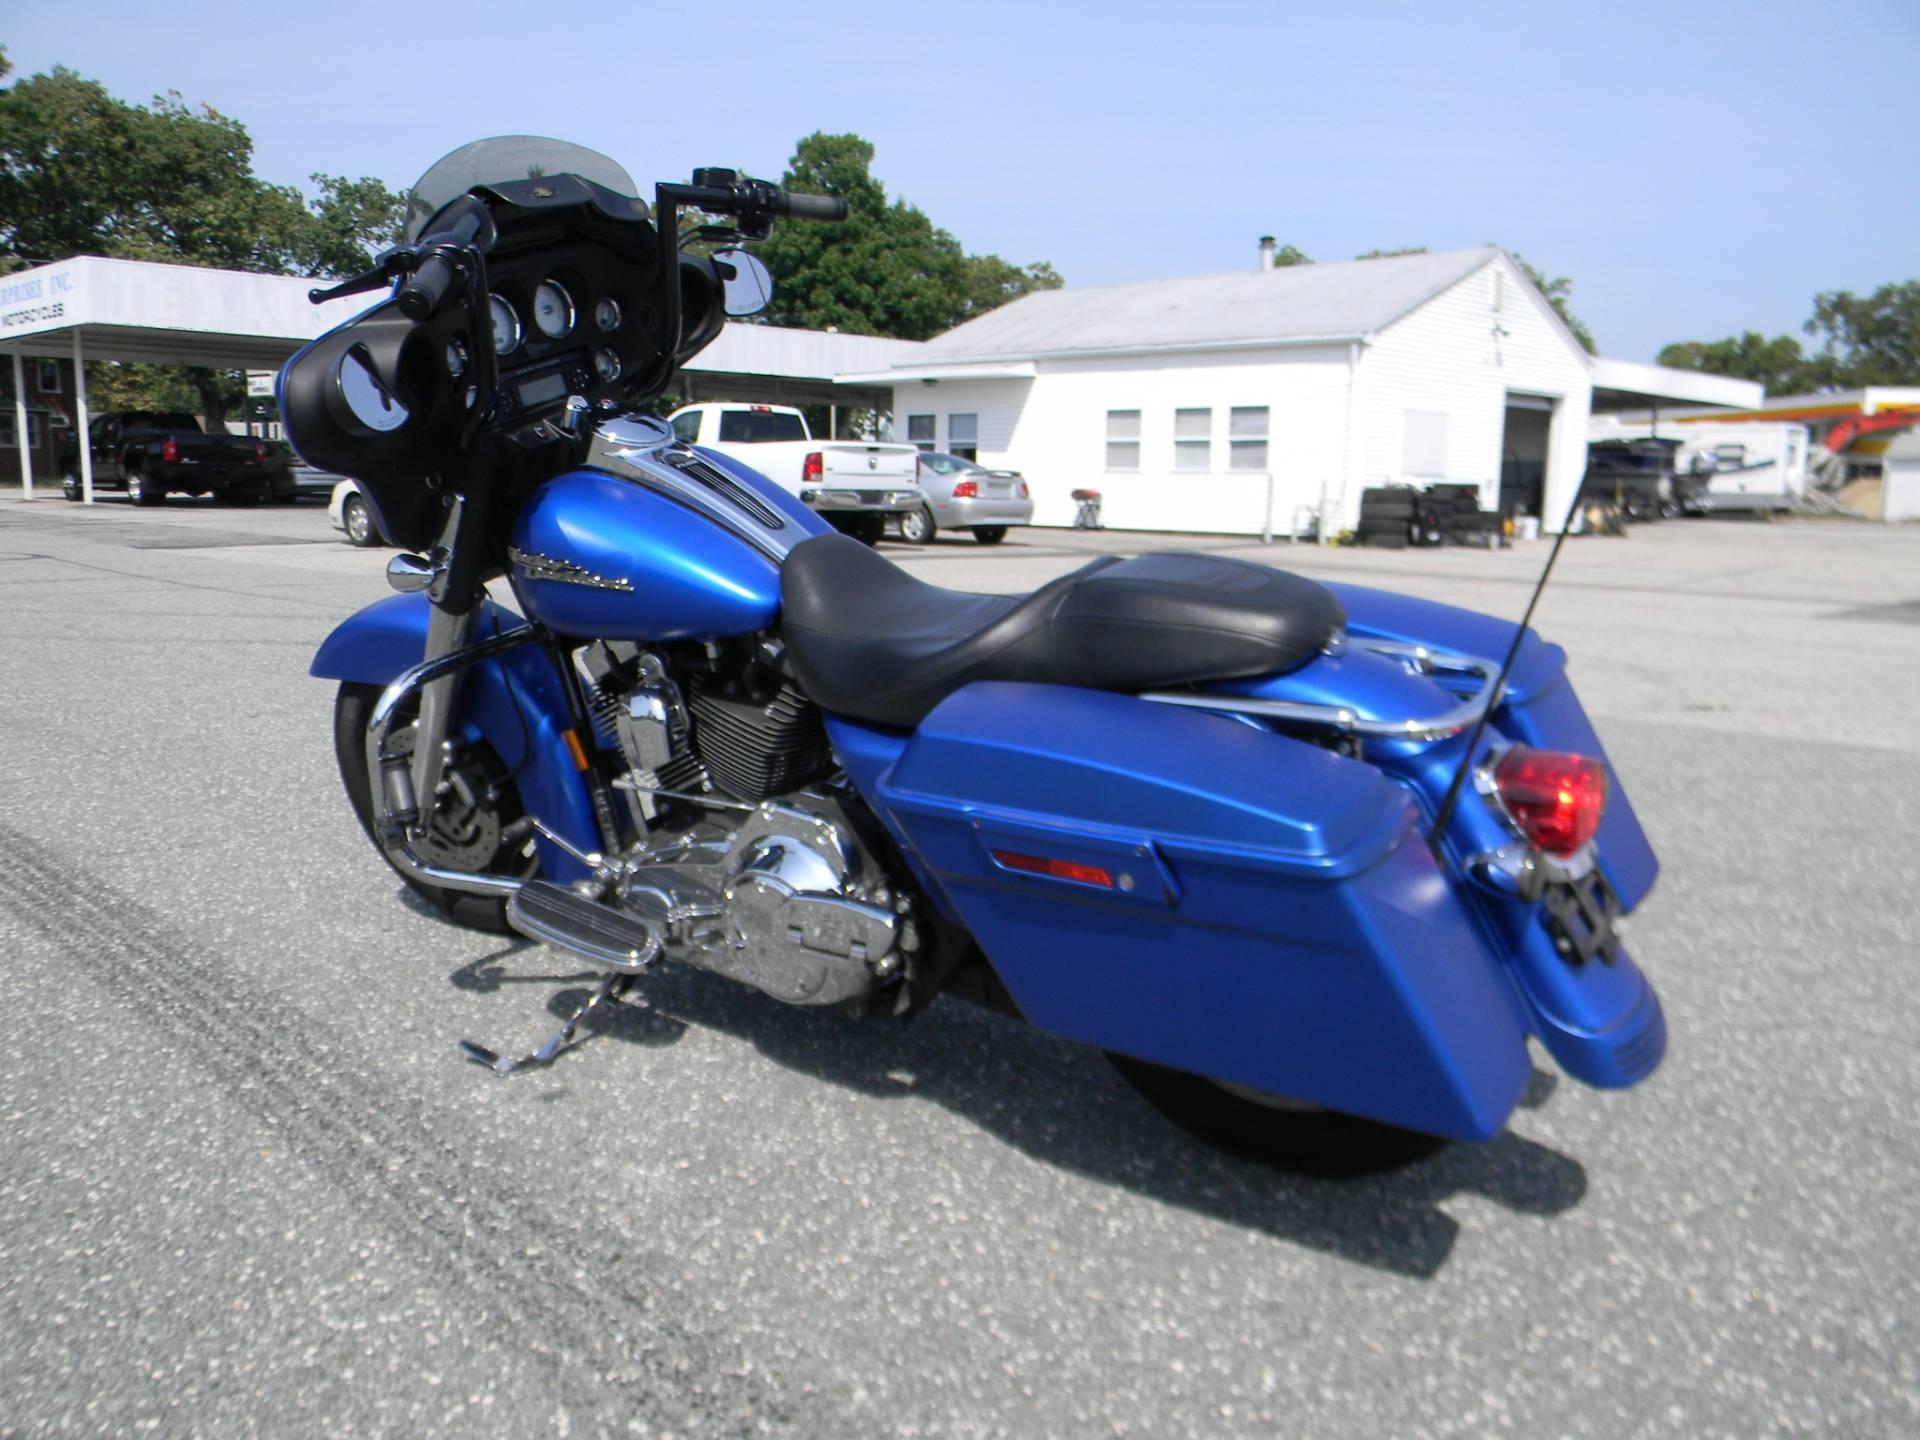 2007 Harley-Davidson FLHX Street Glide 8